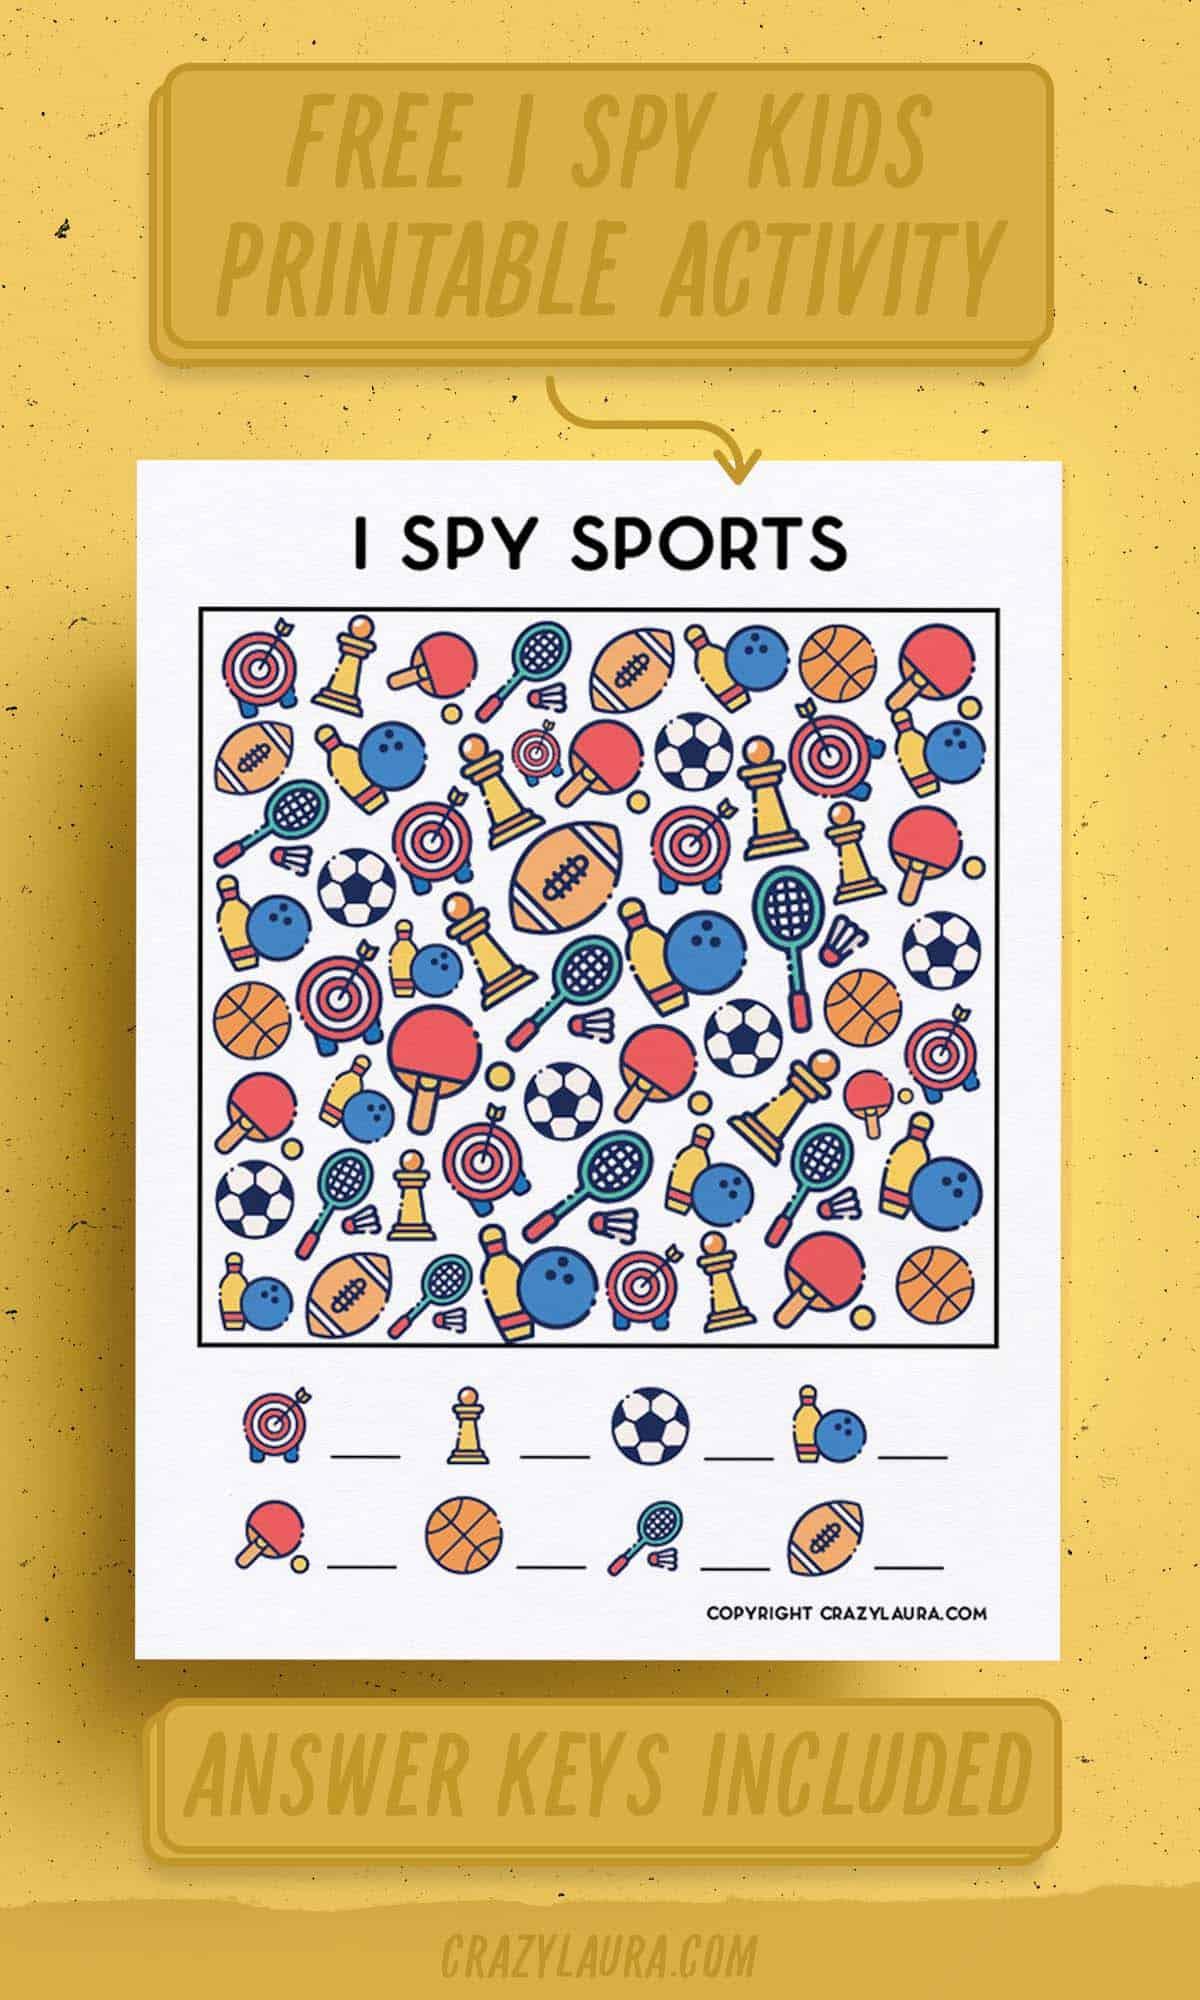 i spy sports activity sheets for free